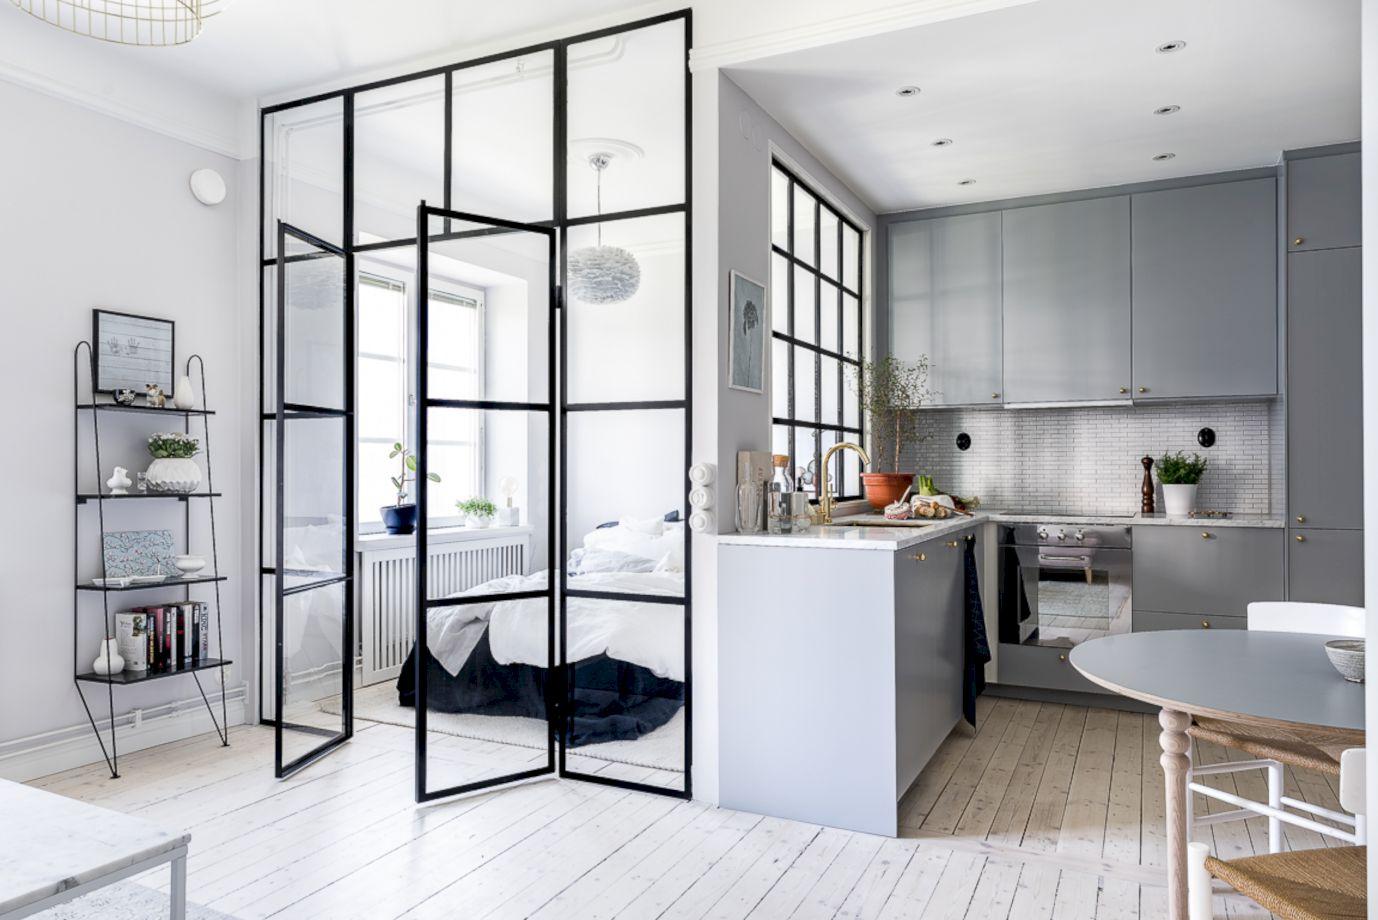 72 Studio Apartment Interior Design On A Budget